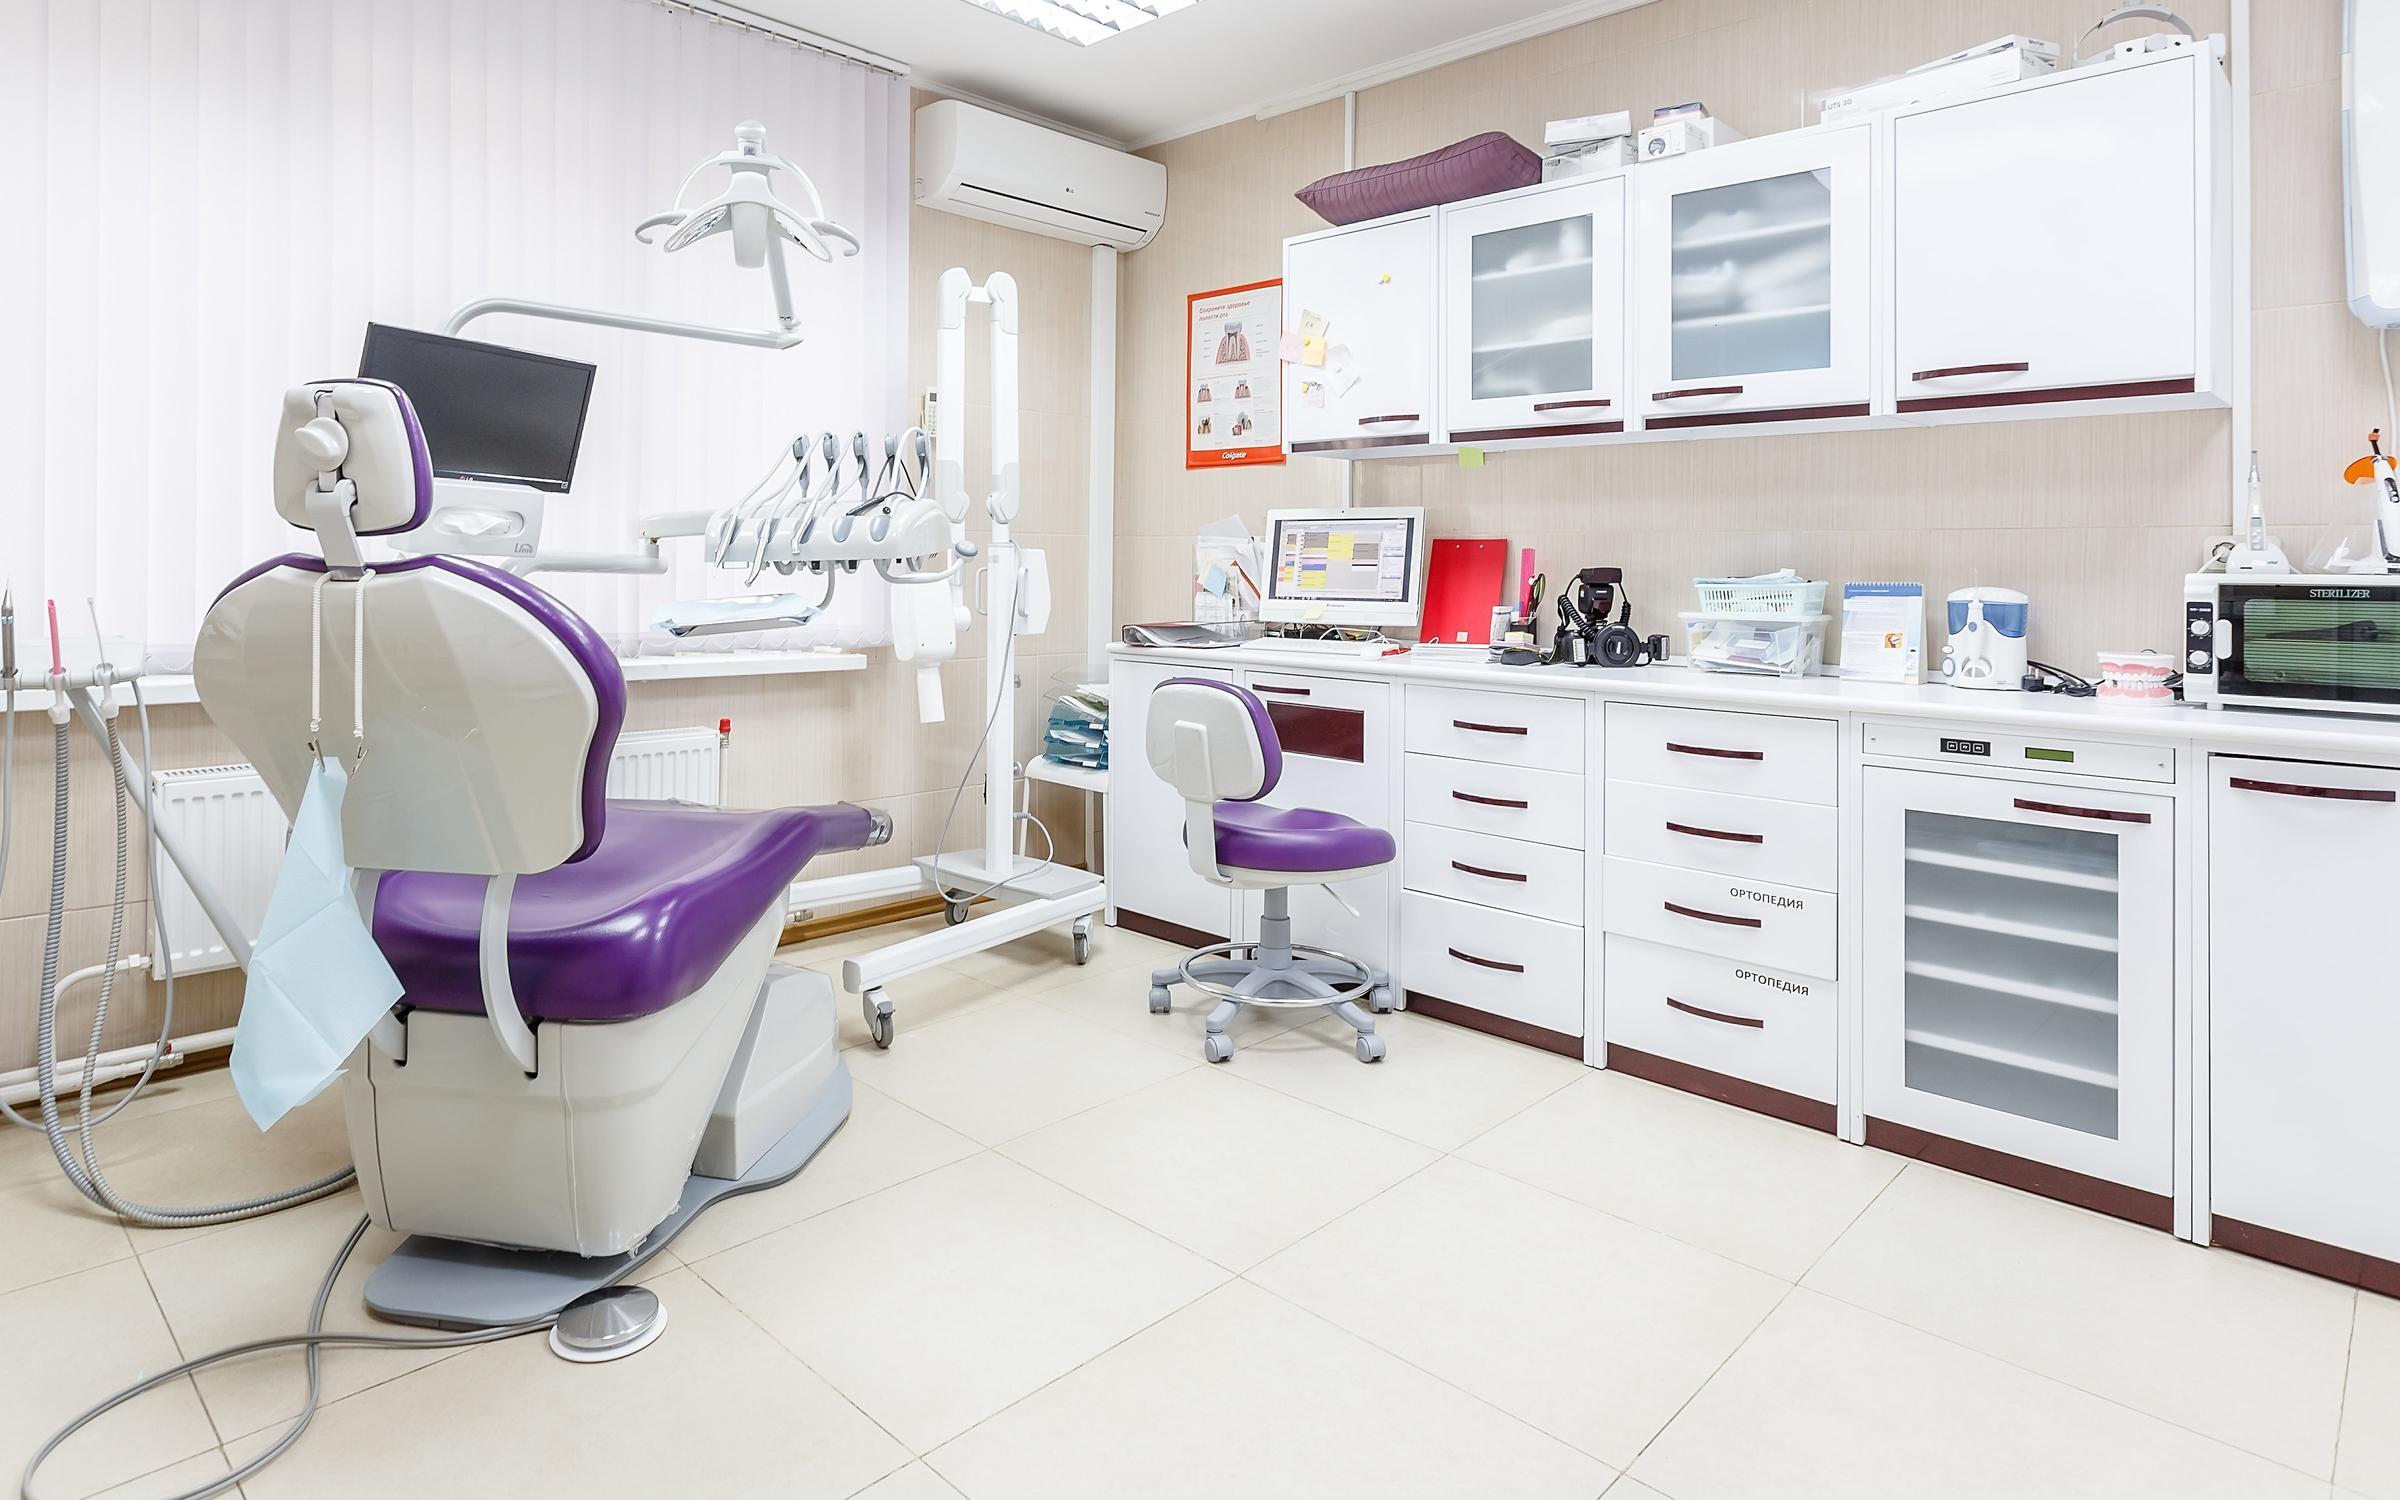 фотография Клиники доктора Левкович в Кудрово